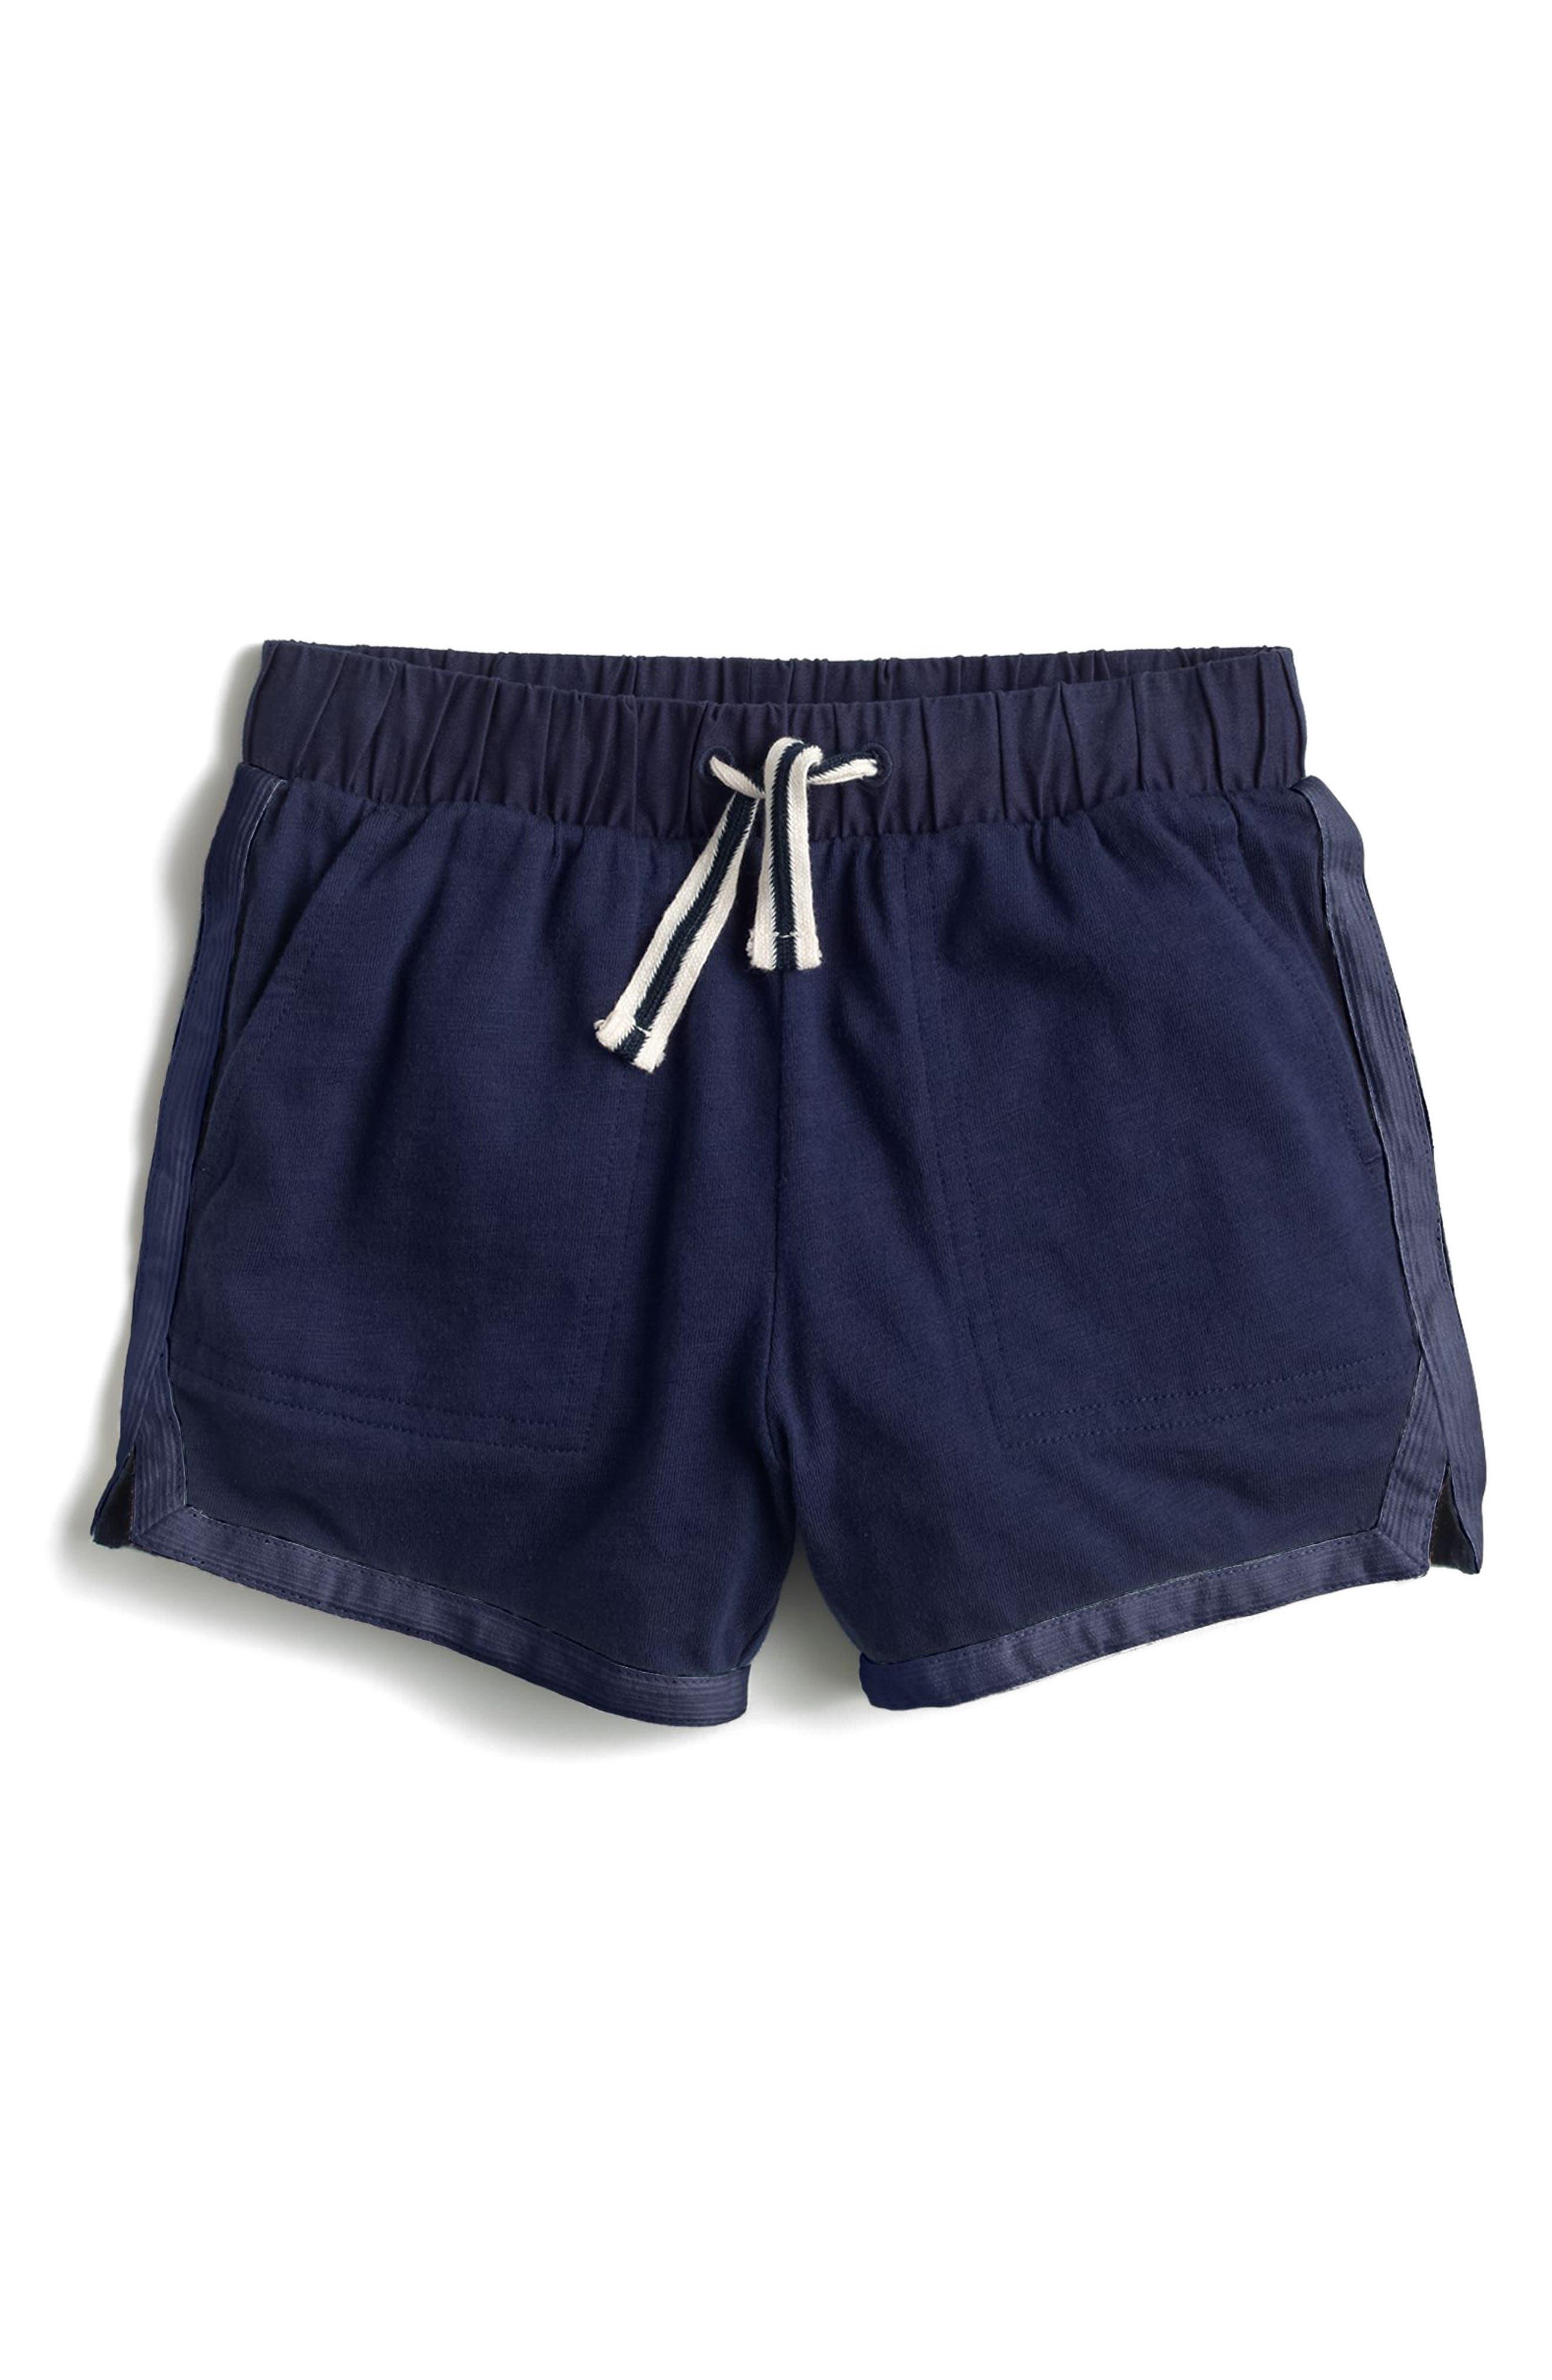 Ester Cotton Shorts,                         Main,                         color, Navy